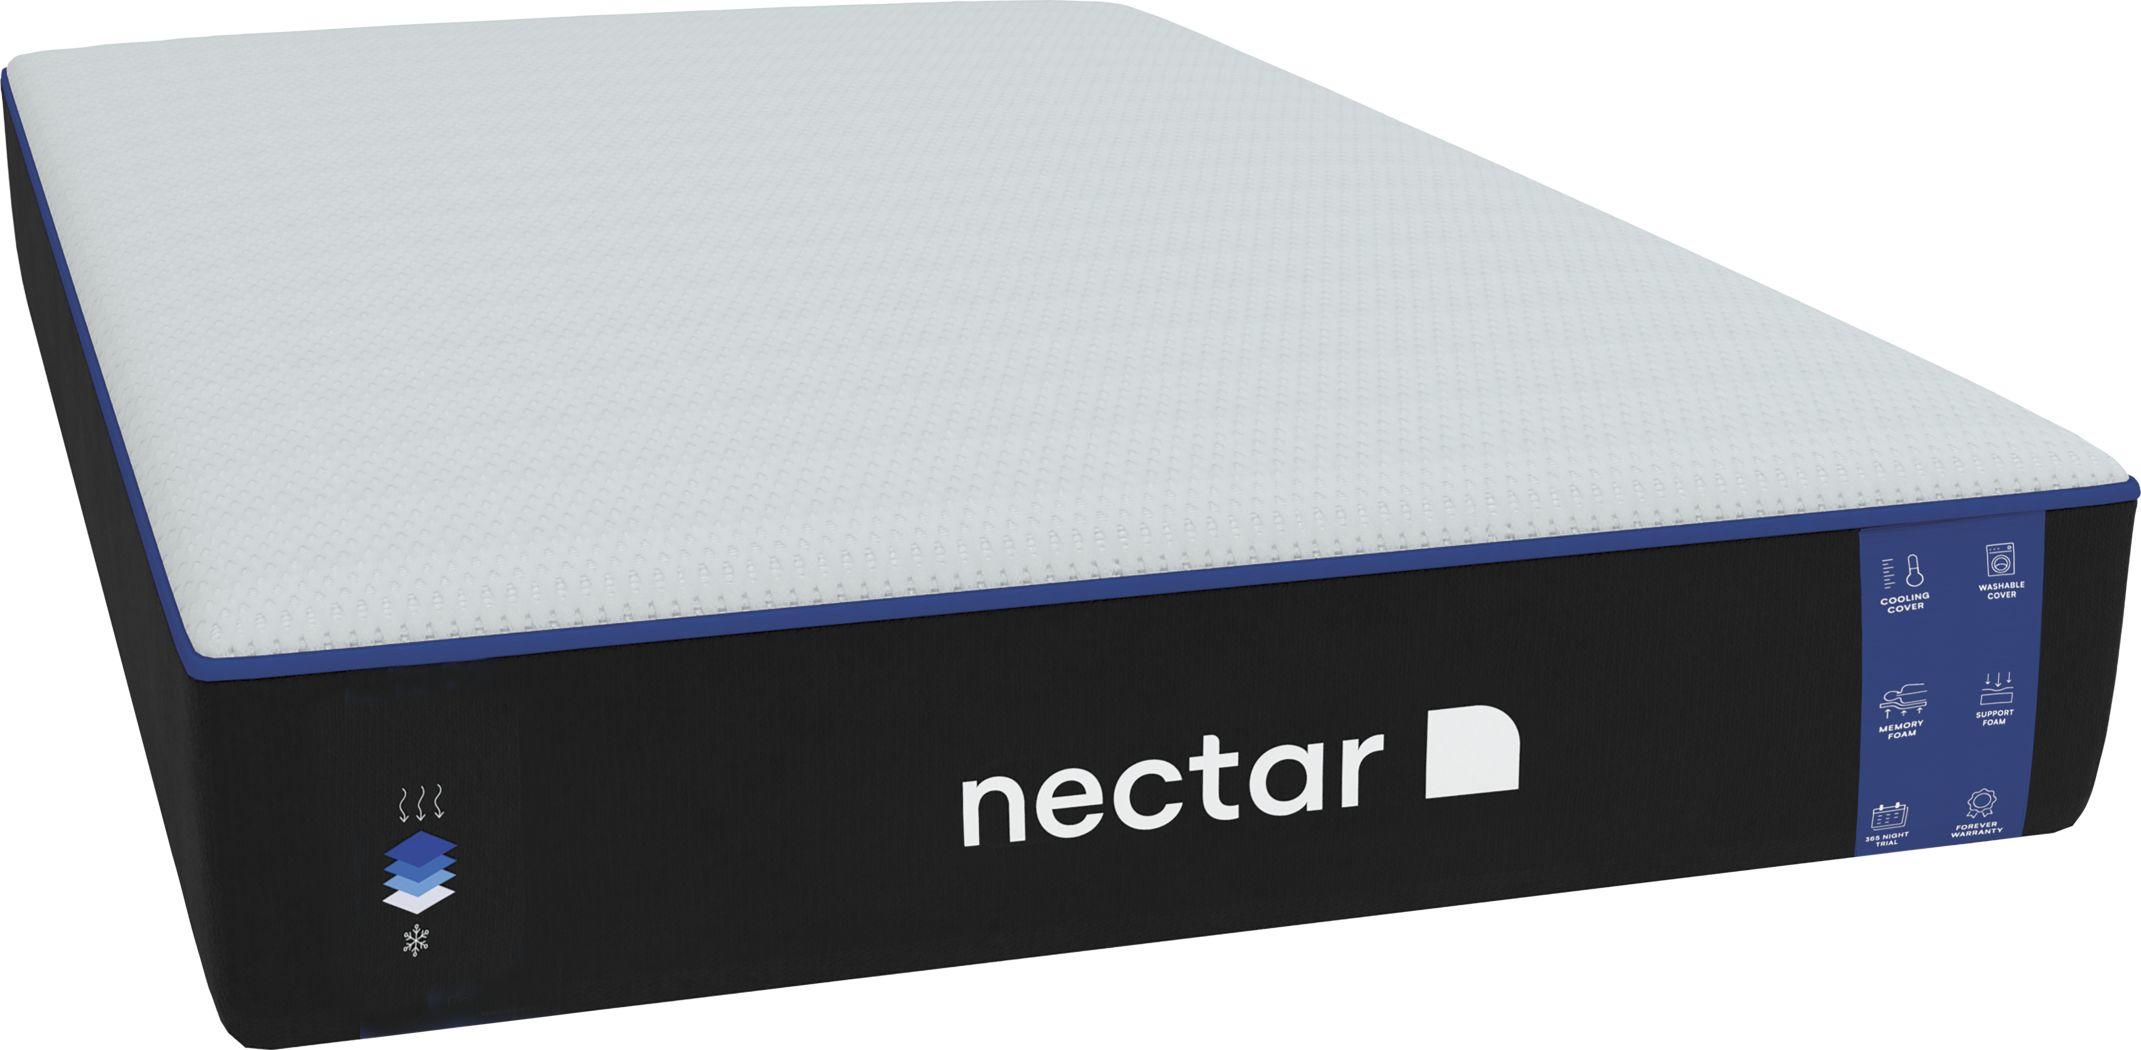 Nectar Classic Twin XL Mattress